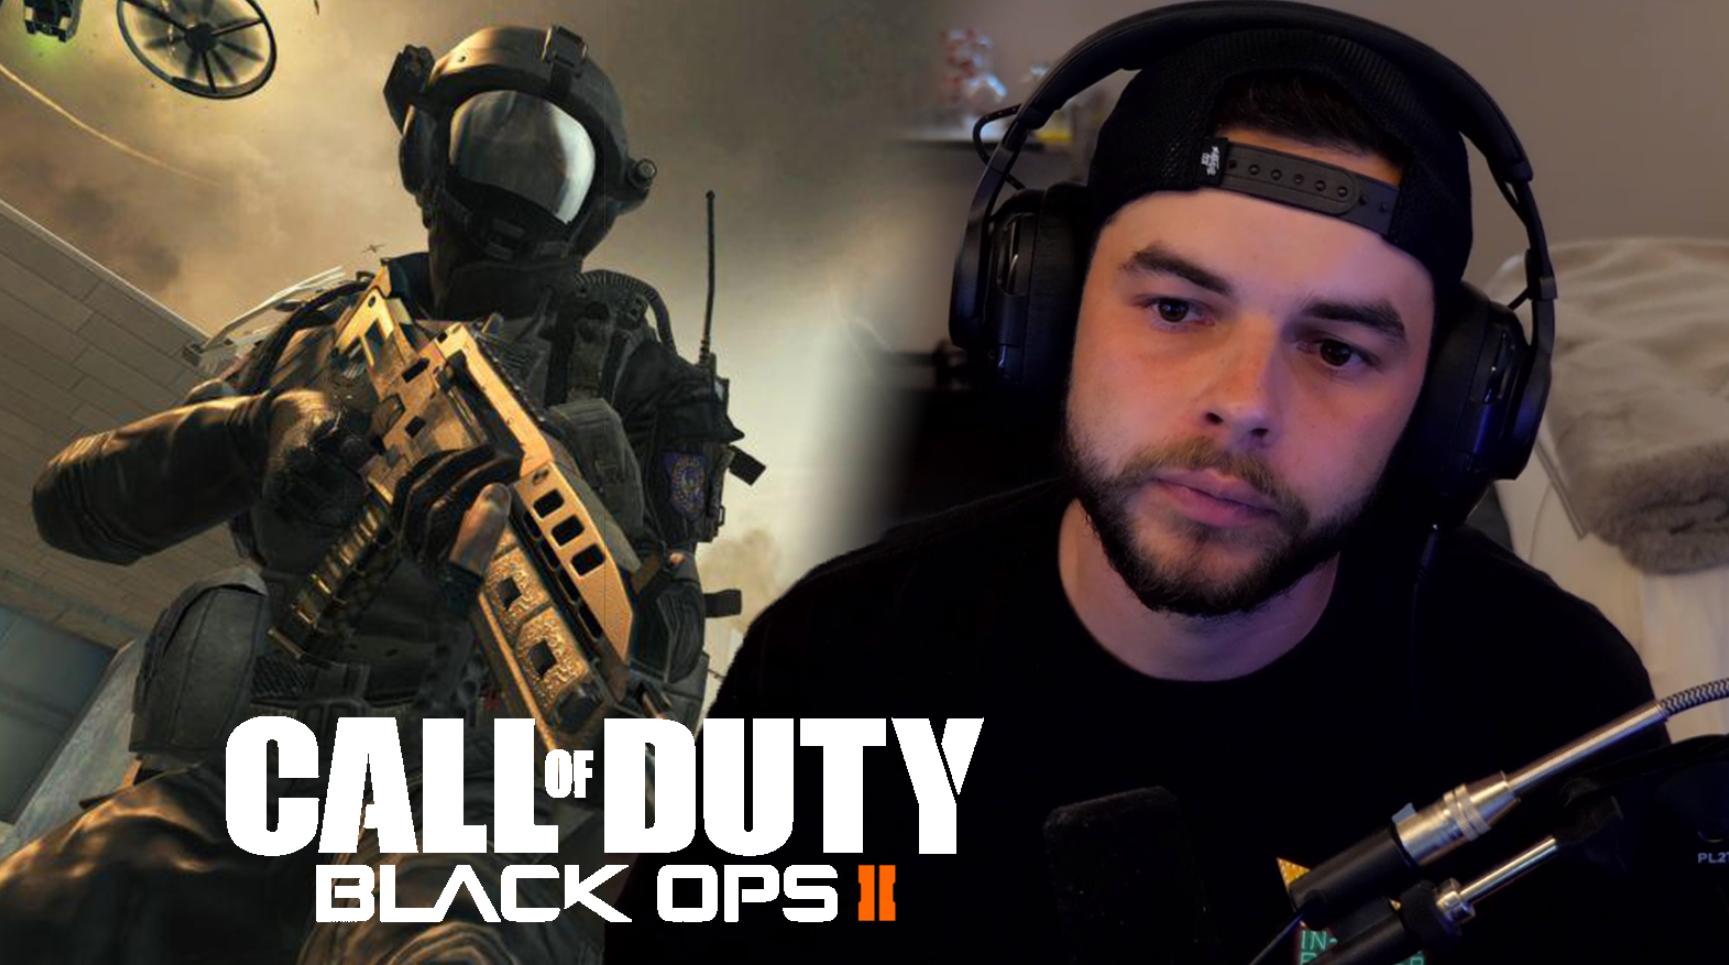 Black Ops 2 gameplay / Nadeshot streaming